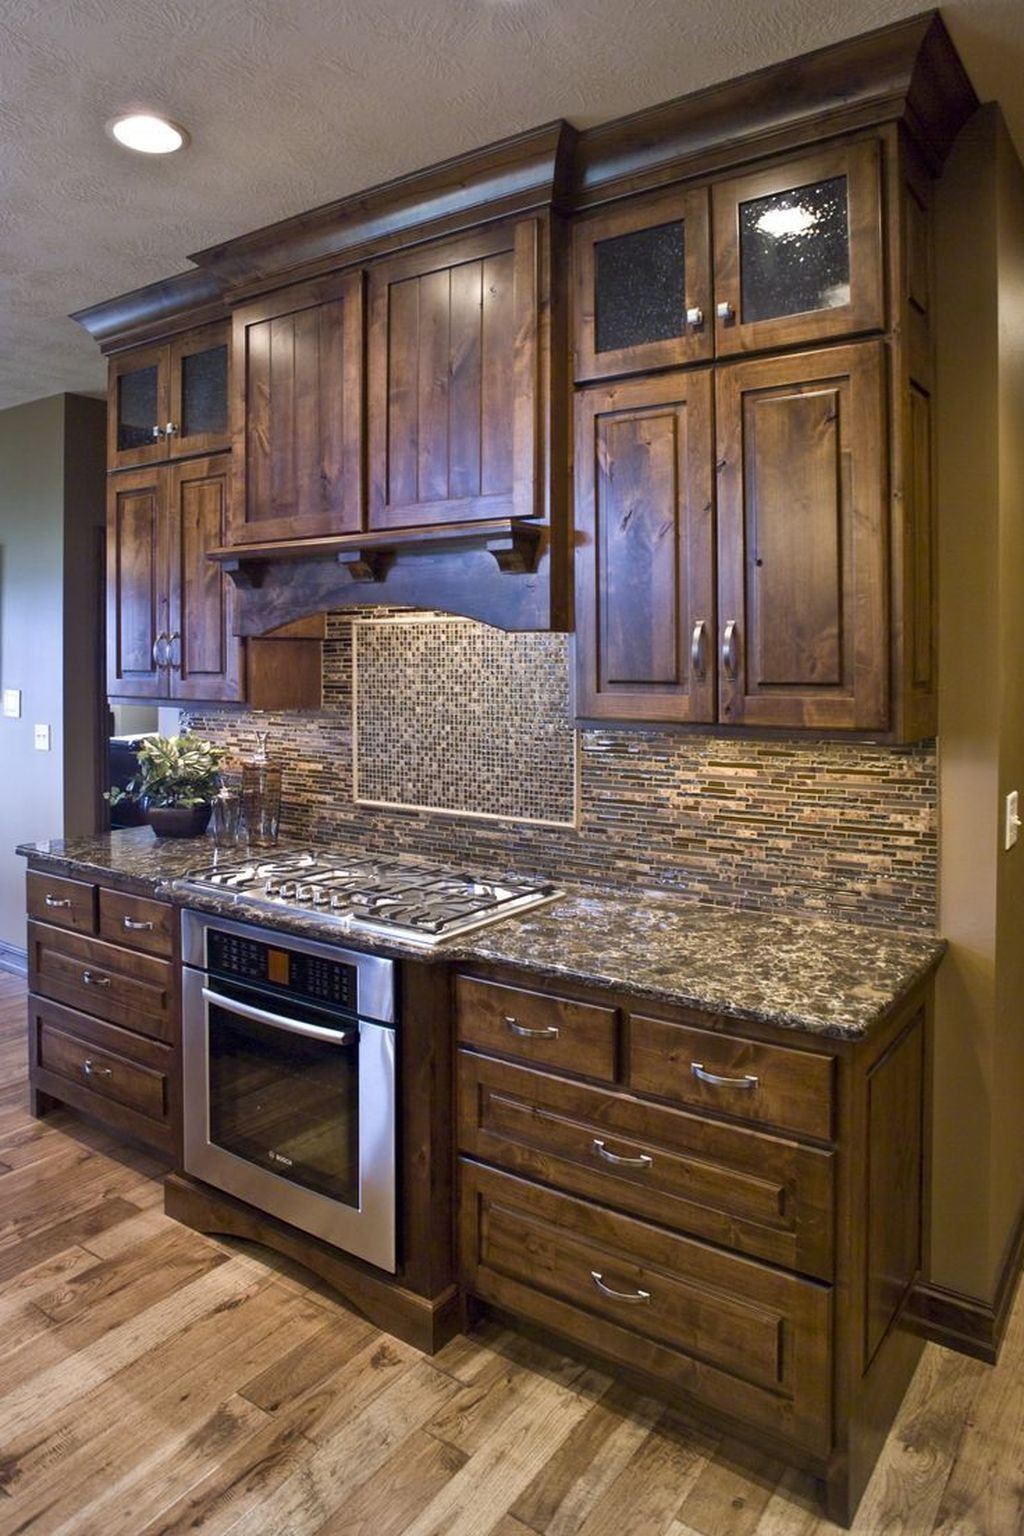 33 nice rustic farmhouse kitchen cabinets design ideas kitchen cabinet styles farmhouse style on kitchen cabinets design id=48929